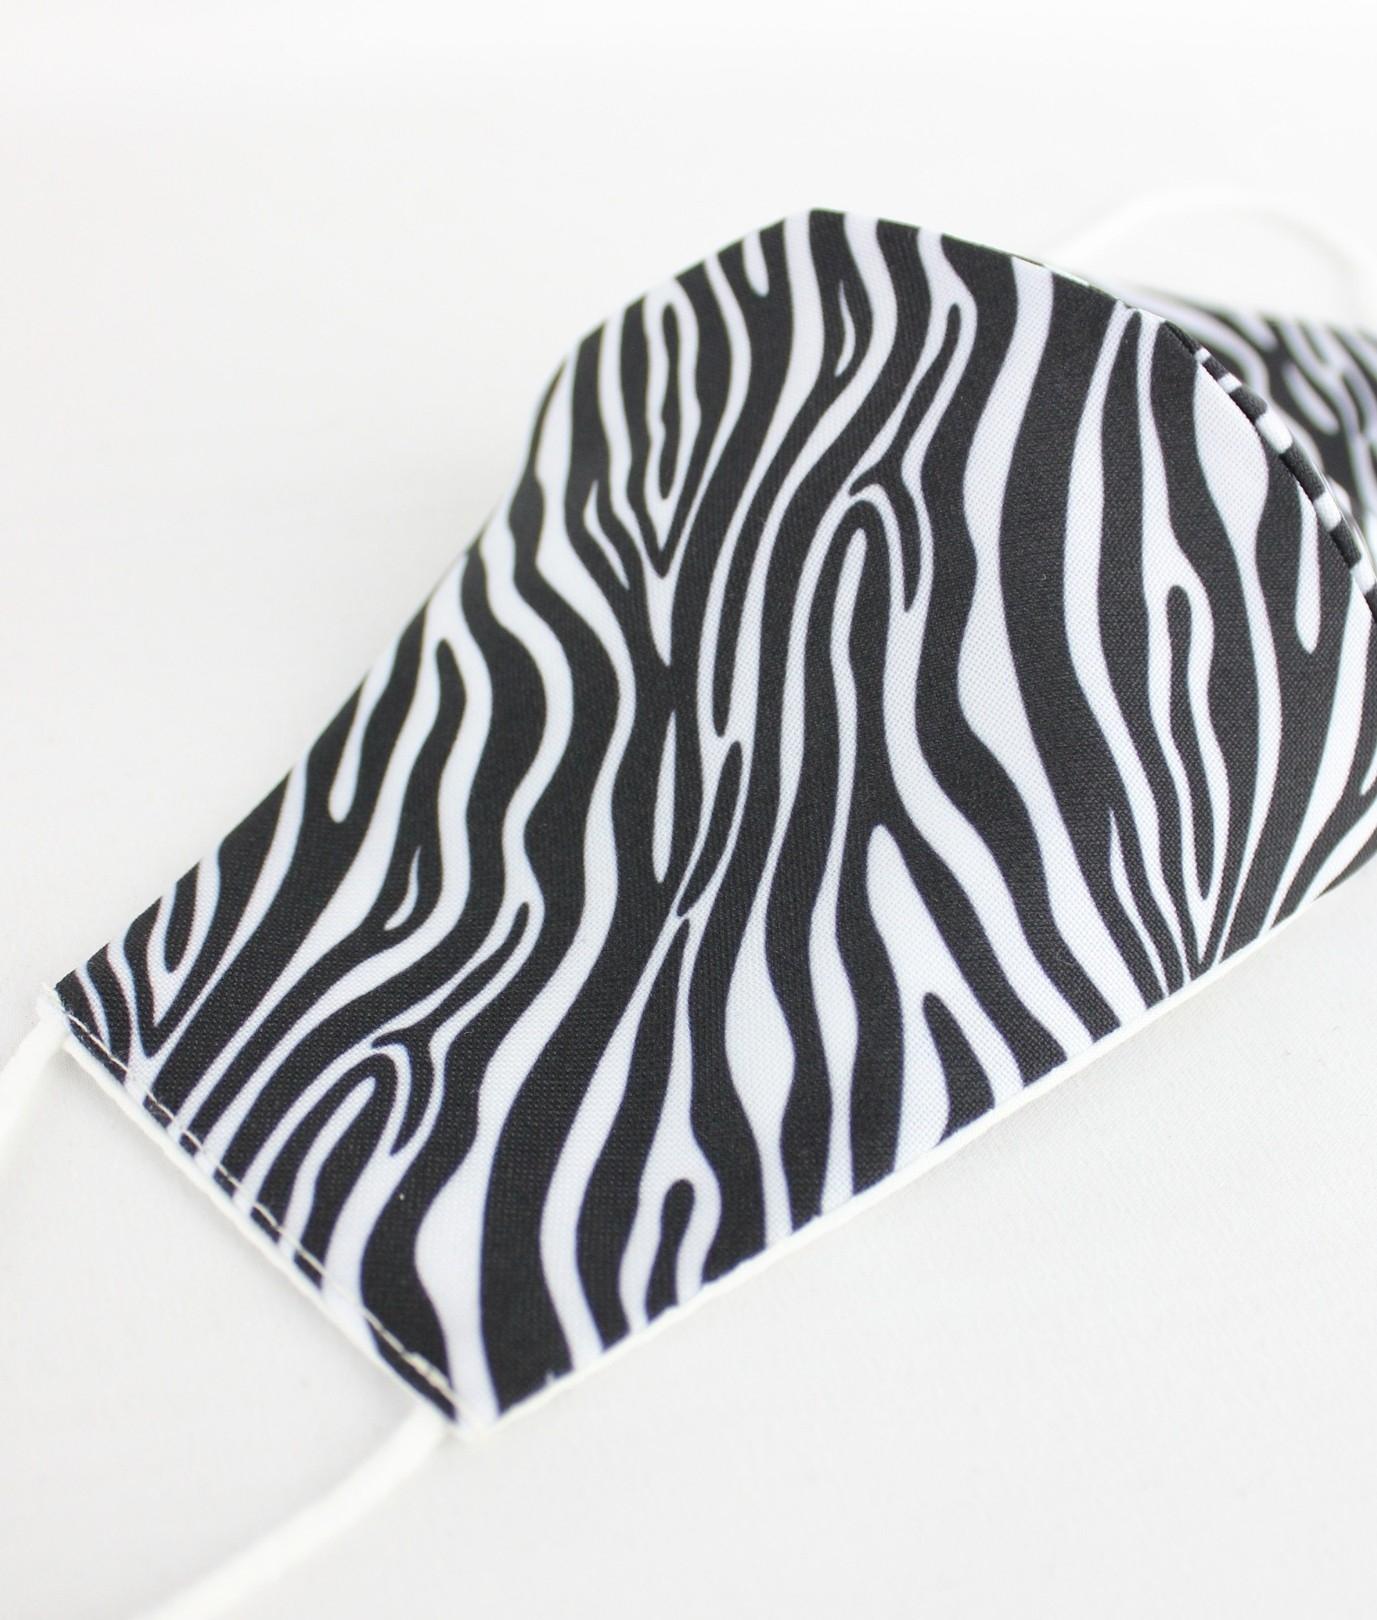 Mascarilla Yesitex - Zebra CG